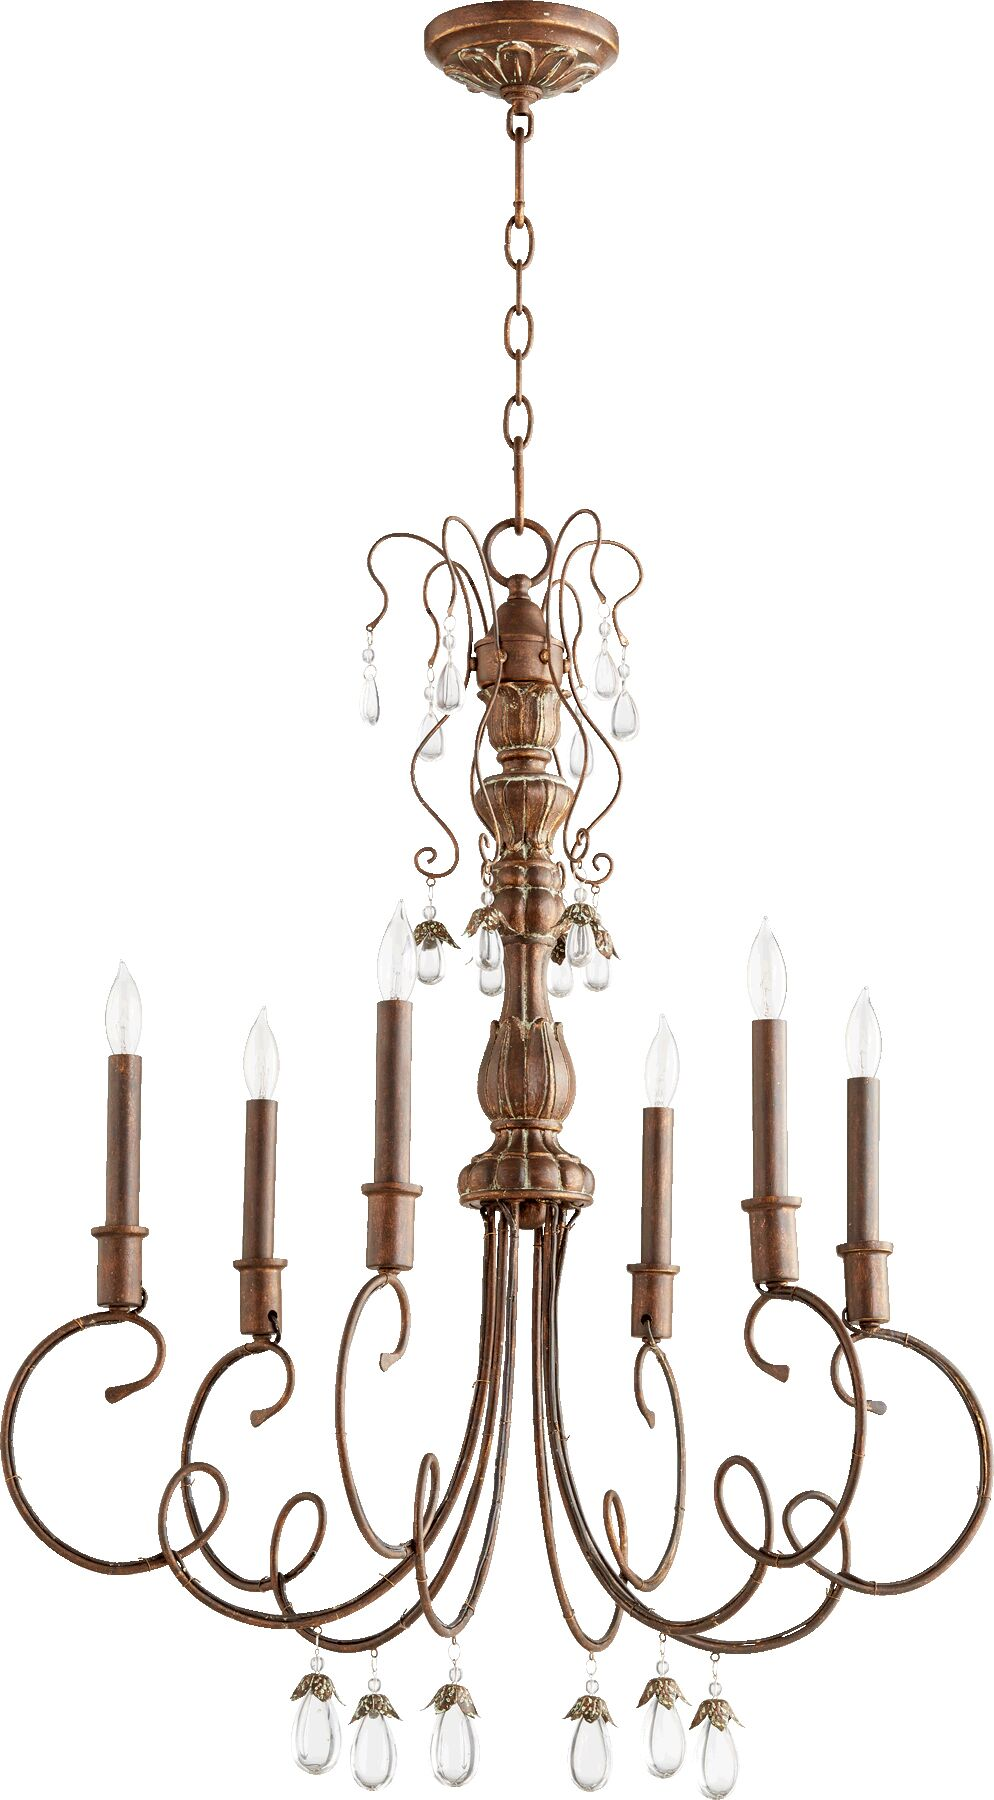 Jaune 6-Light Chandelier Finish: Vintage Copper